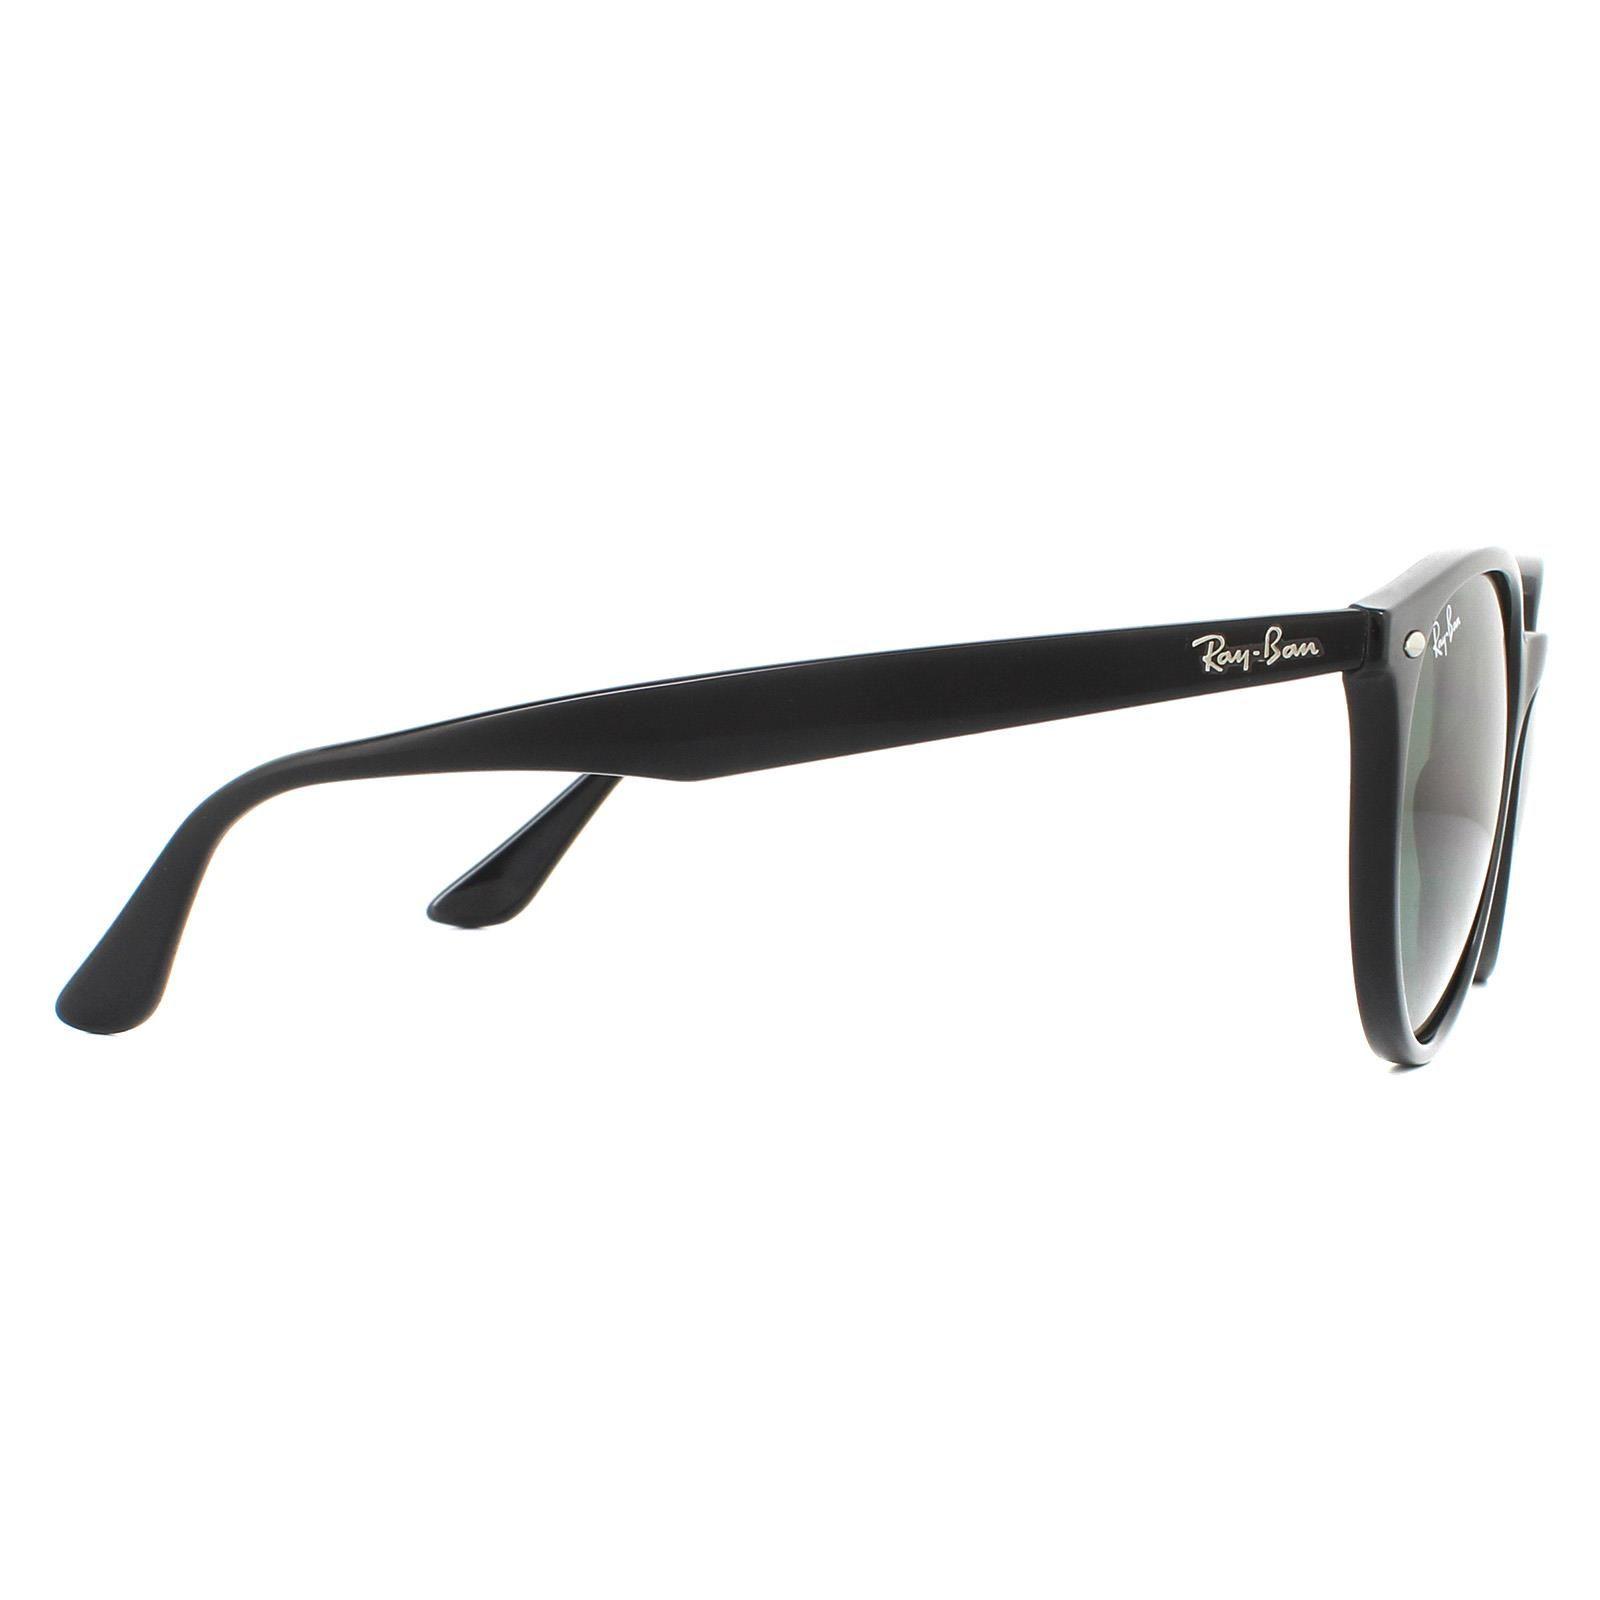 Ray-Ban Sunglasses RB4305 601/71 Black Green G-15